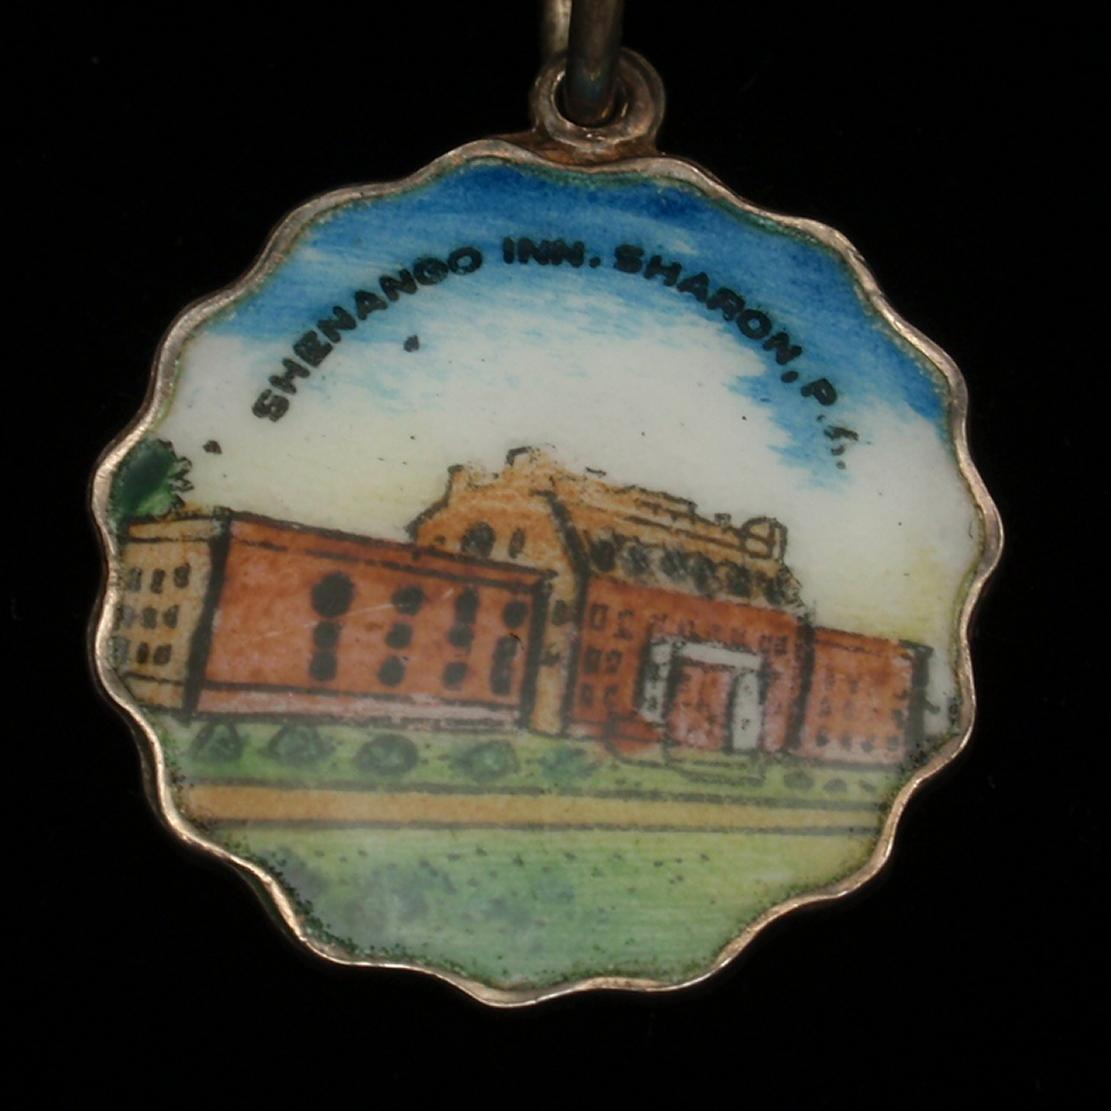 Shenango Inn Sharon Pennsylvania Silver & Enamel Charm Travel Souvenir